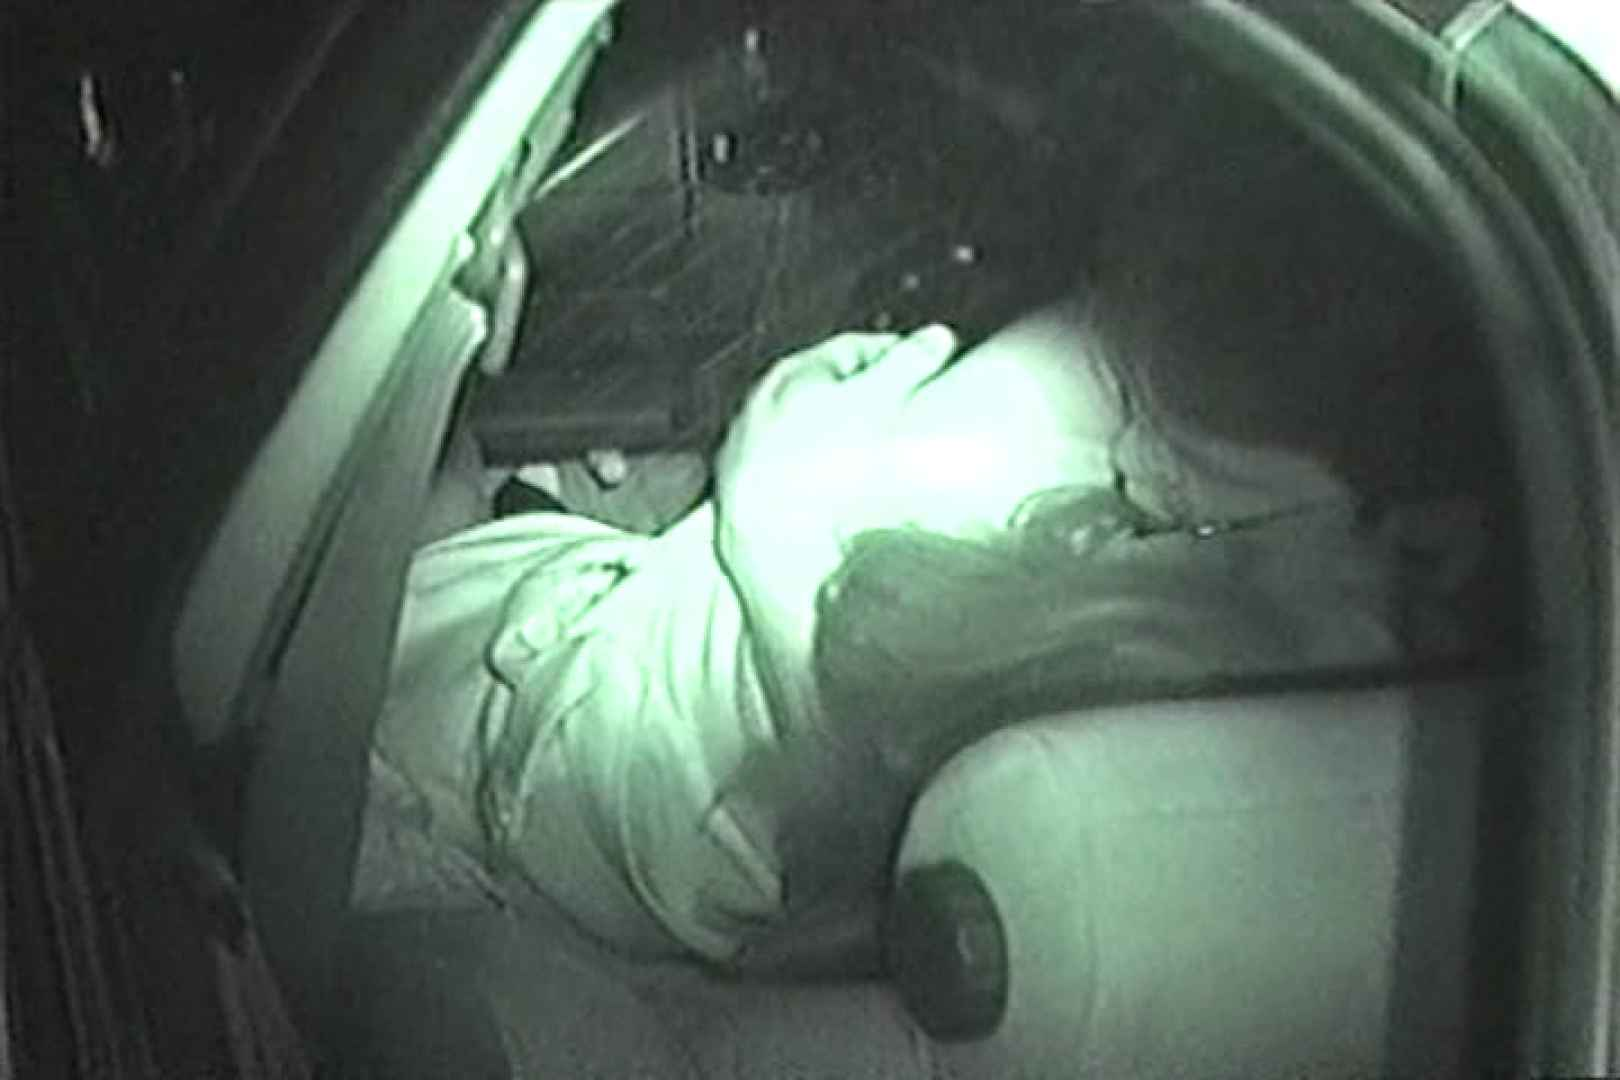 MASAさんの待ち伏せ撮り! 赤外線カーセックスVol.18 OLエロ画像 盗み撮りAV無料動画キャプチャ 64PICs 2